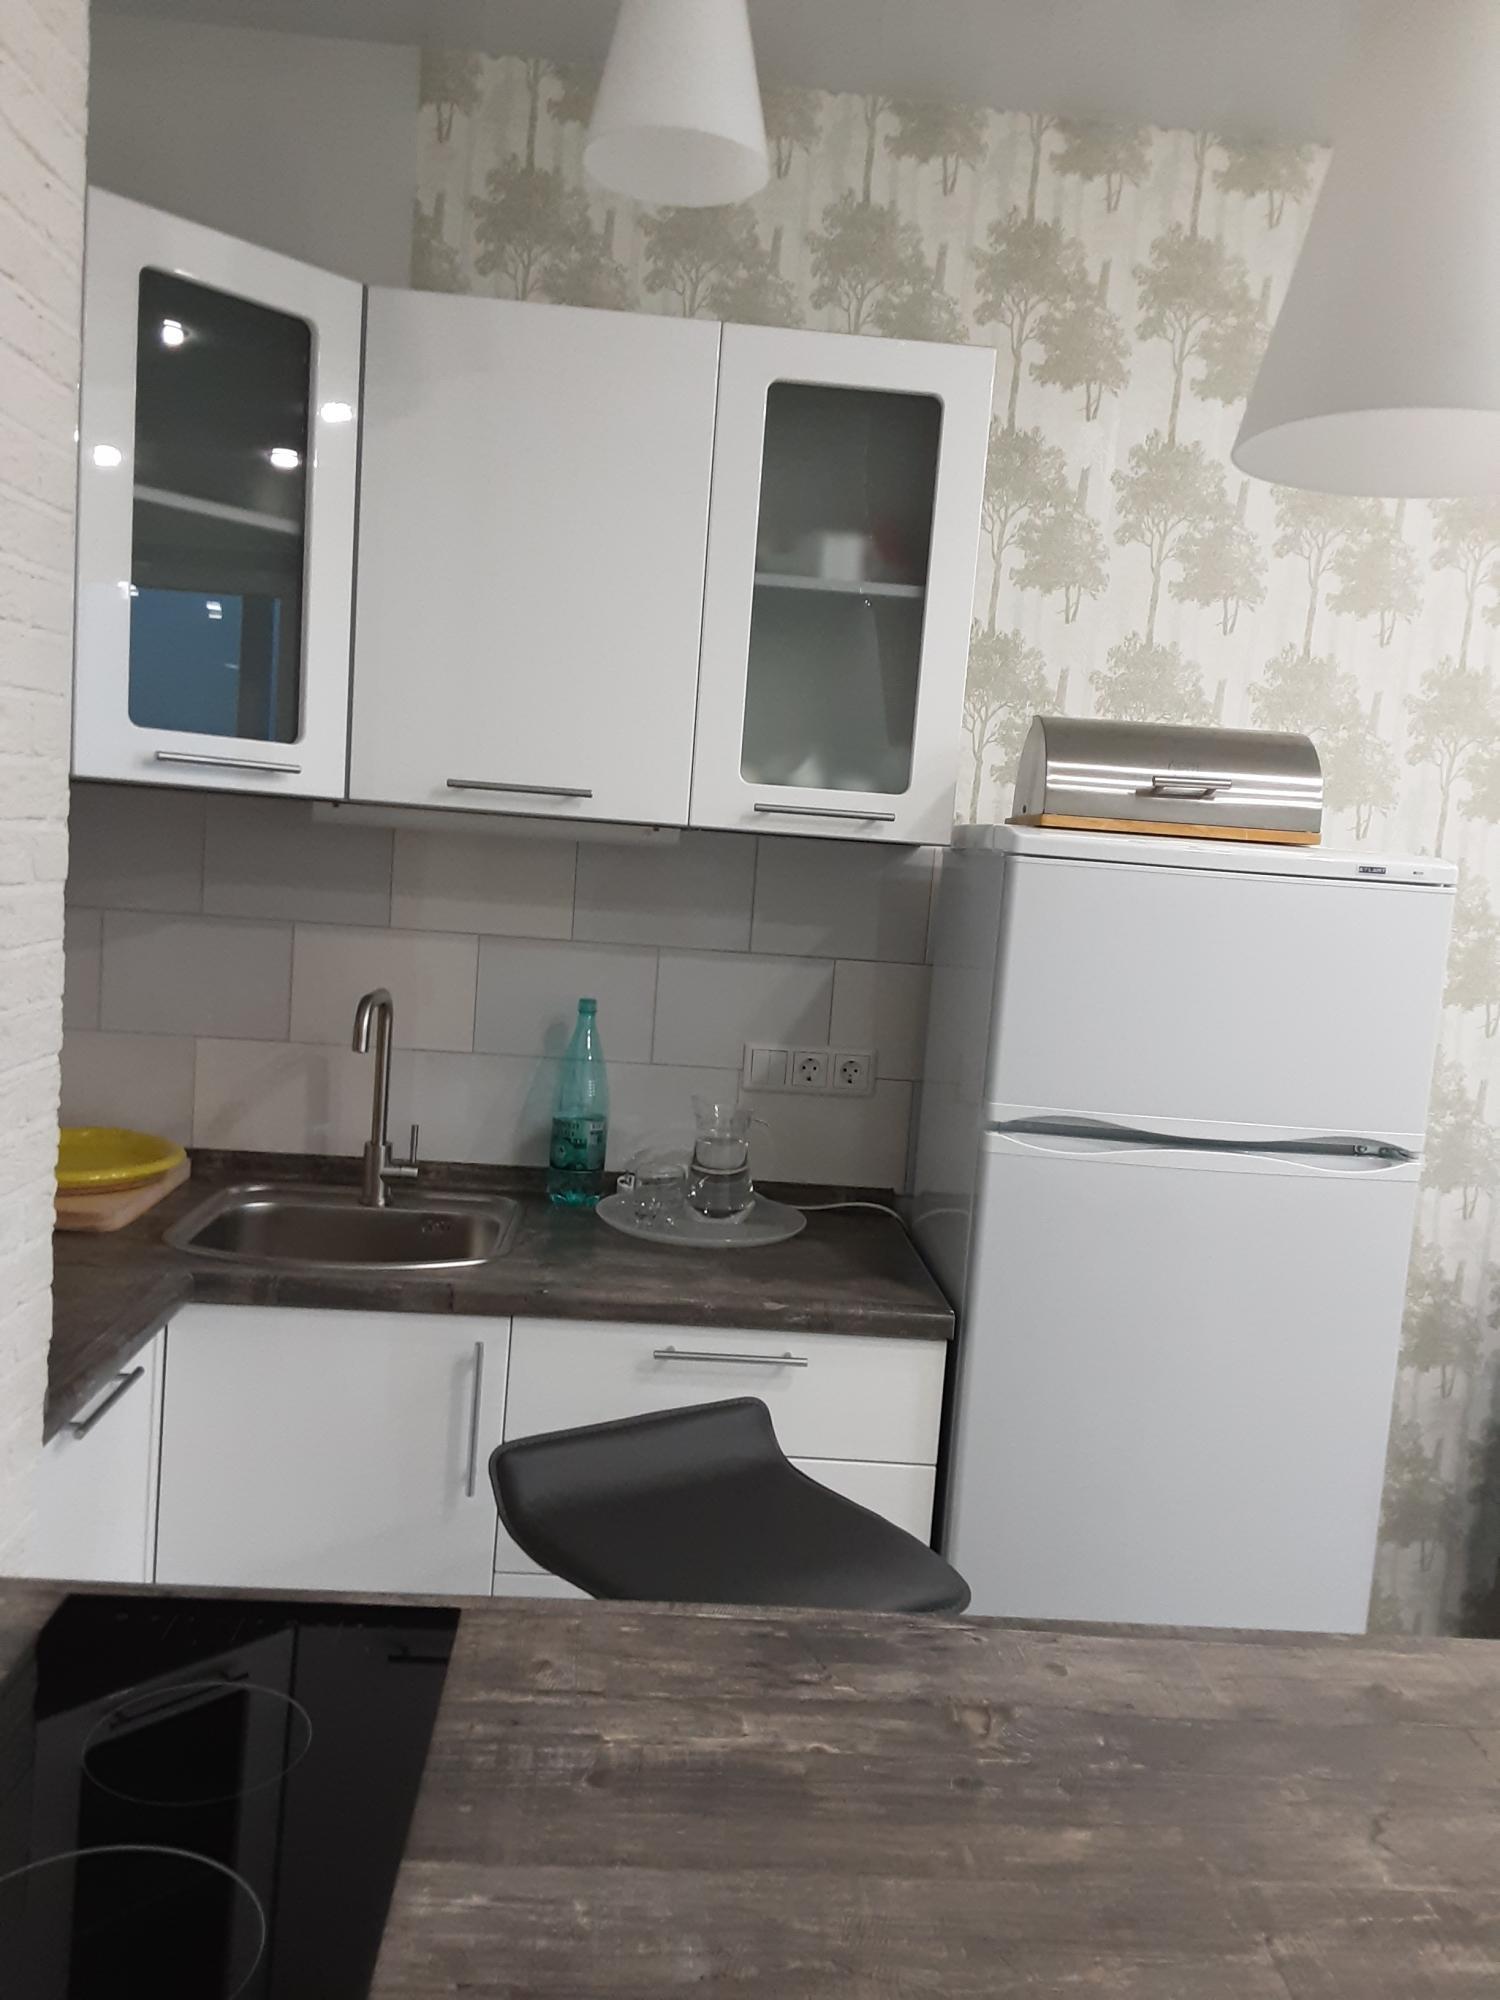 Apartment, Studio, 26 m2 in Lyubertsy 89773577037 buy 2